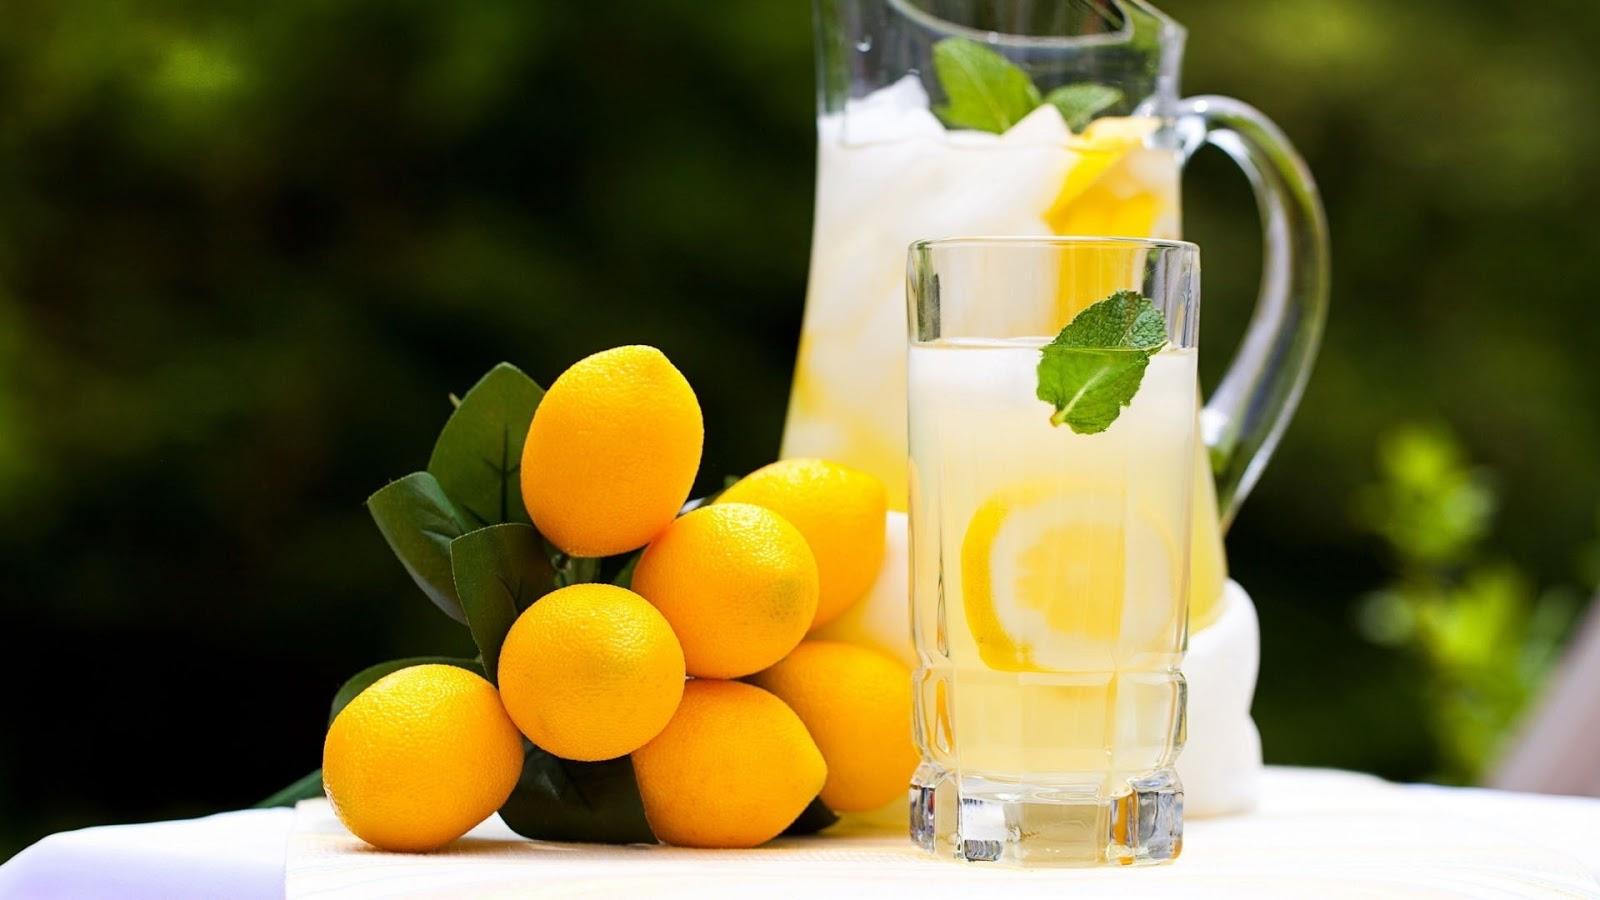 http://4.bp.blogspot.com/-cUBMIUUKFxU/UNBAl-NYyII/AAAAAAAAKTE/PrEkjx6JncY/s1600/autumns-lemonade.jpg